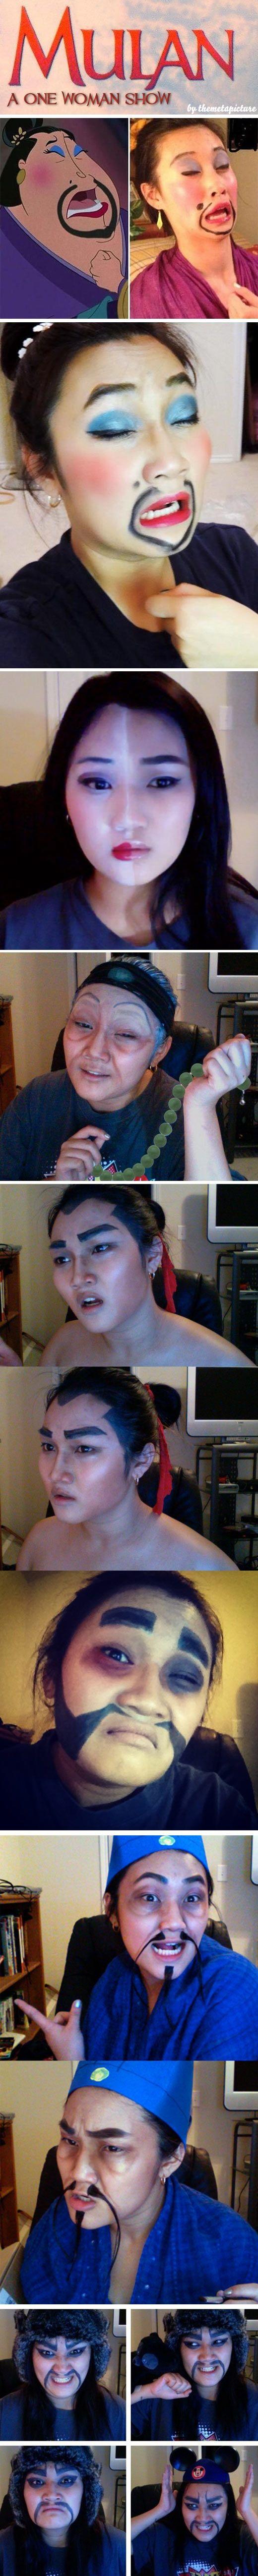 One woman Mulan